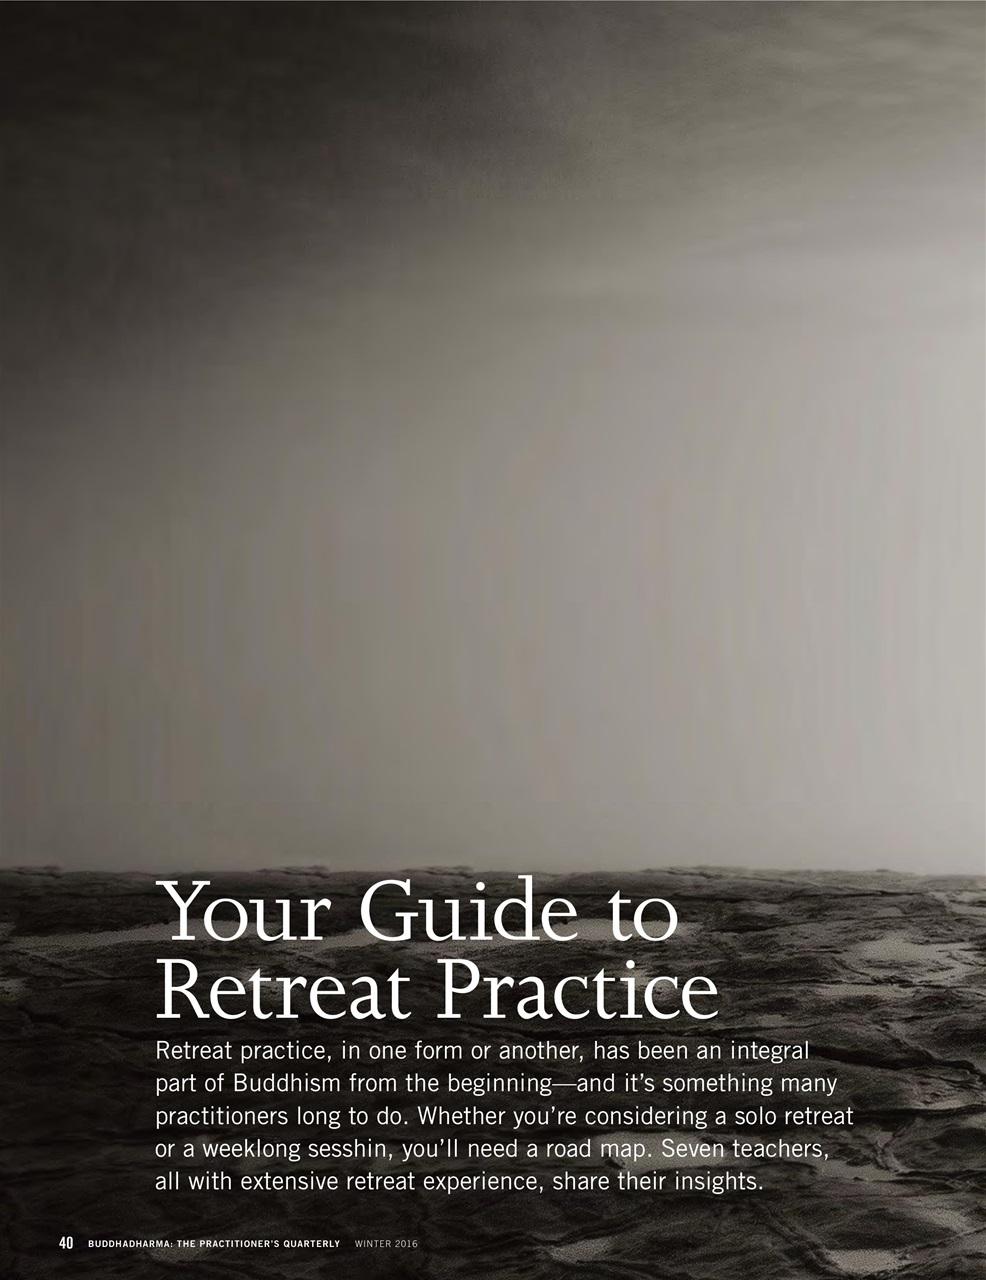 Buddhadharma Magazine The practitioner's Quarterly 15th Special Anniversary